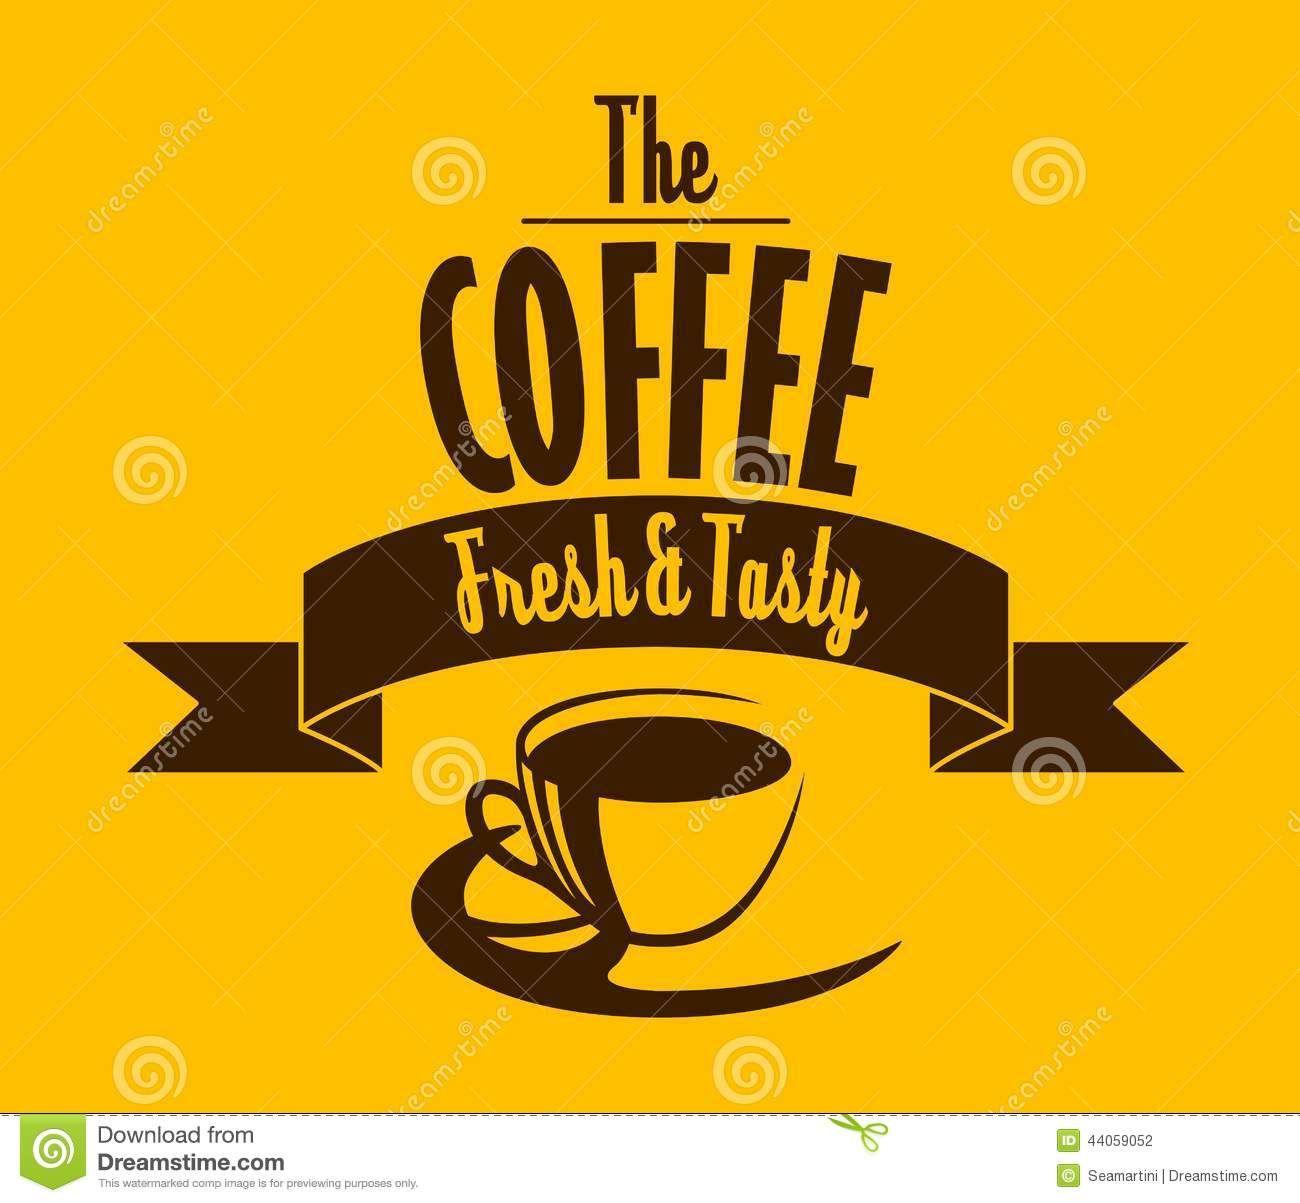 Povezana slika Coffee shop design, Coffee poster, Heart